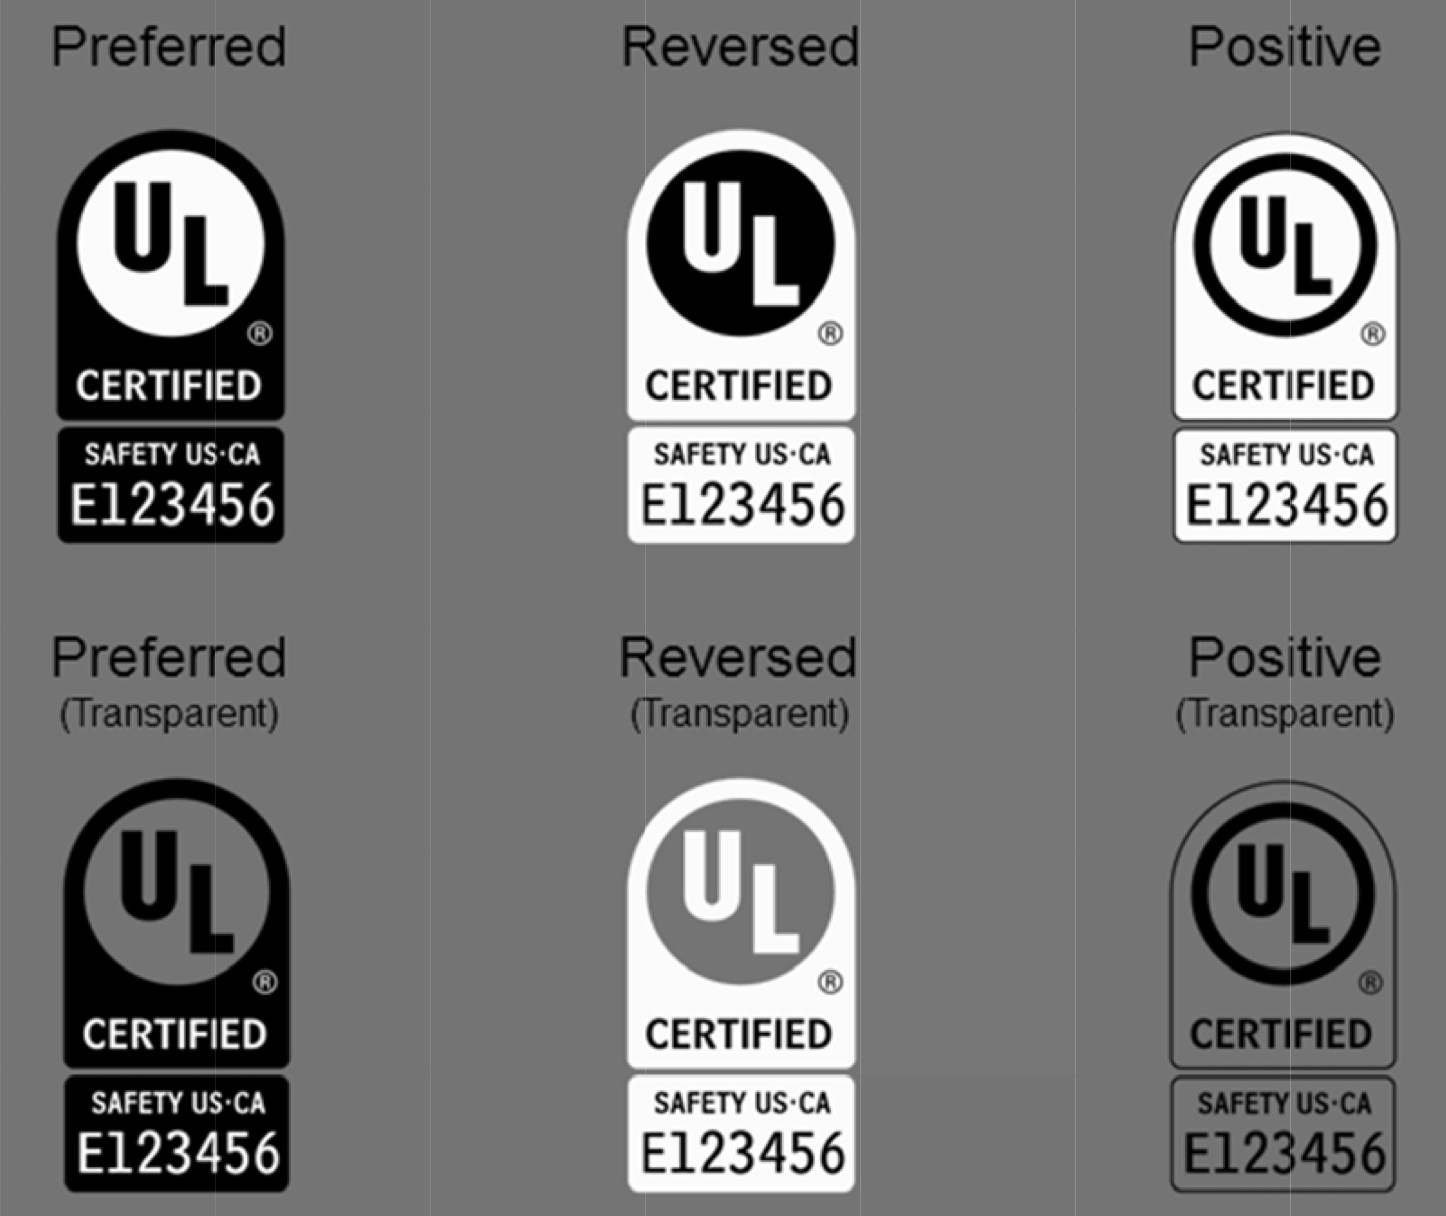 ul-symbols